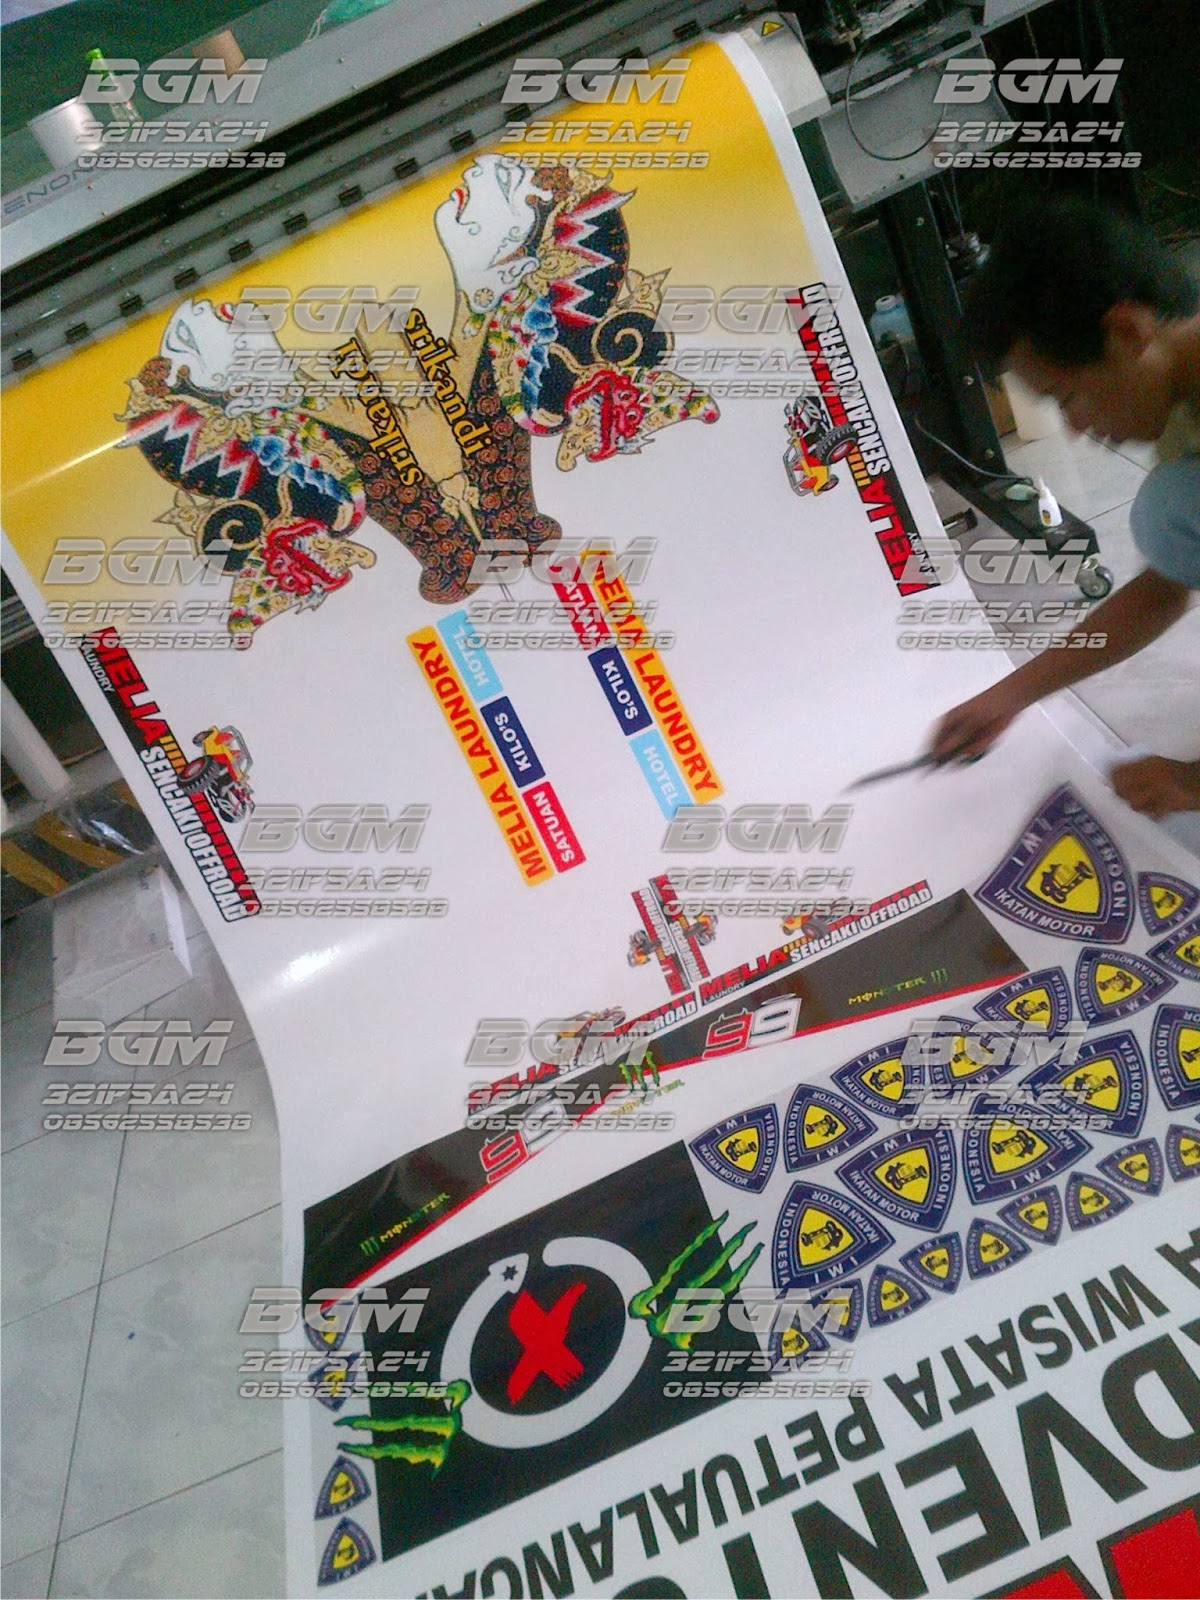 IMI - Ikatan Motor Indonesia Backgrounds on Wallpapers Vista